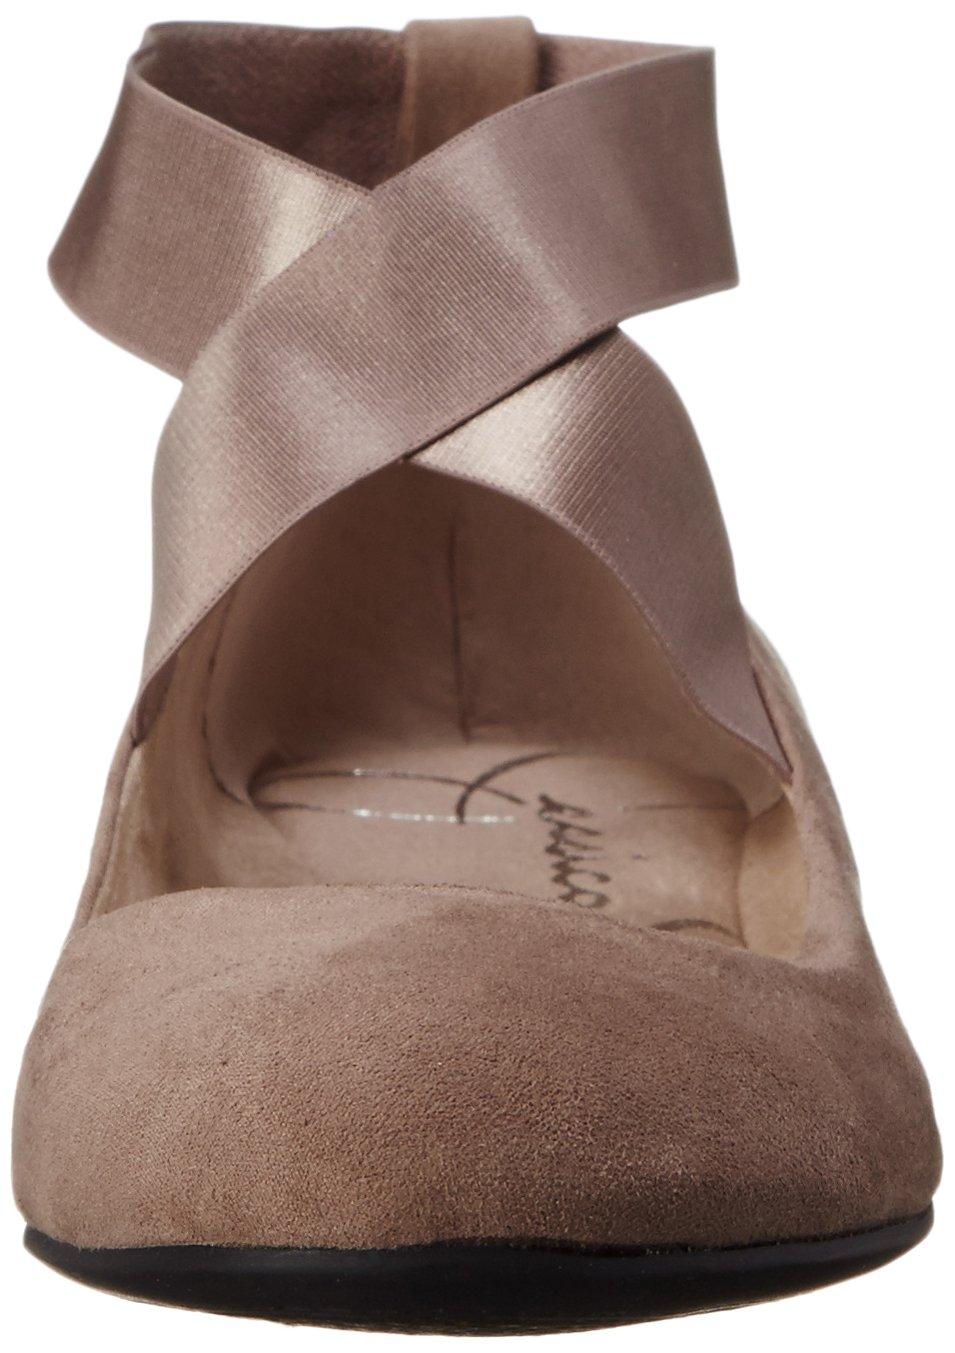 Jessica Simpson Women's Mandayss Ballet Flat B00WGASRH0 9 B(M) US|Slater Taupe